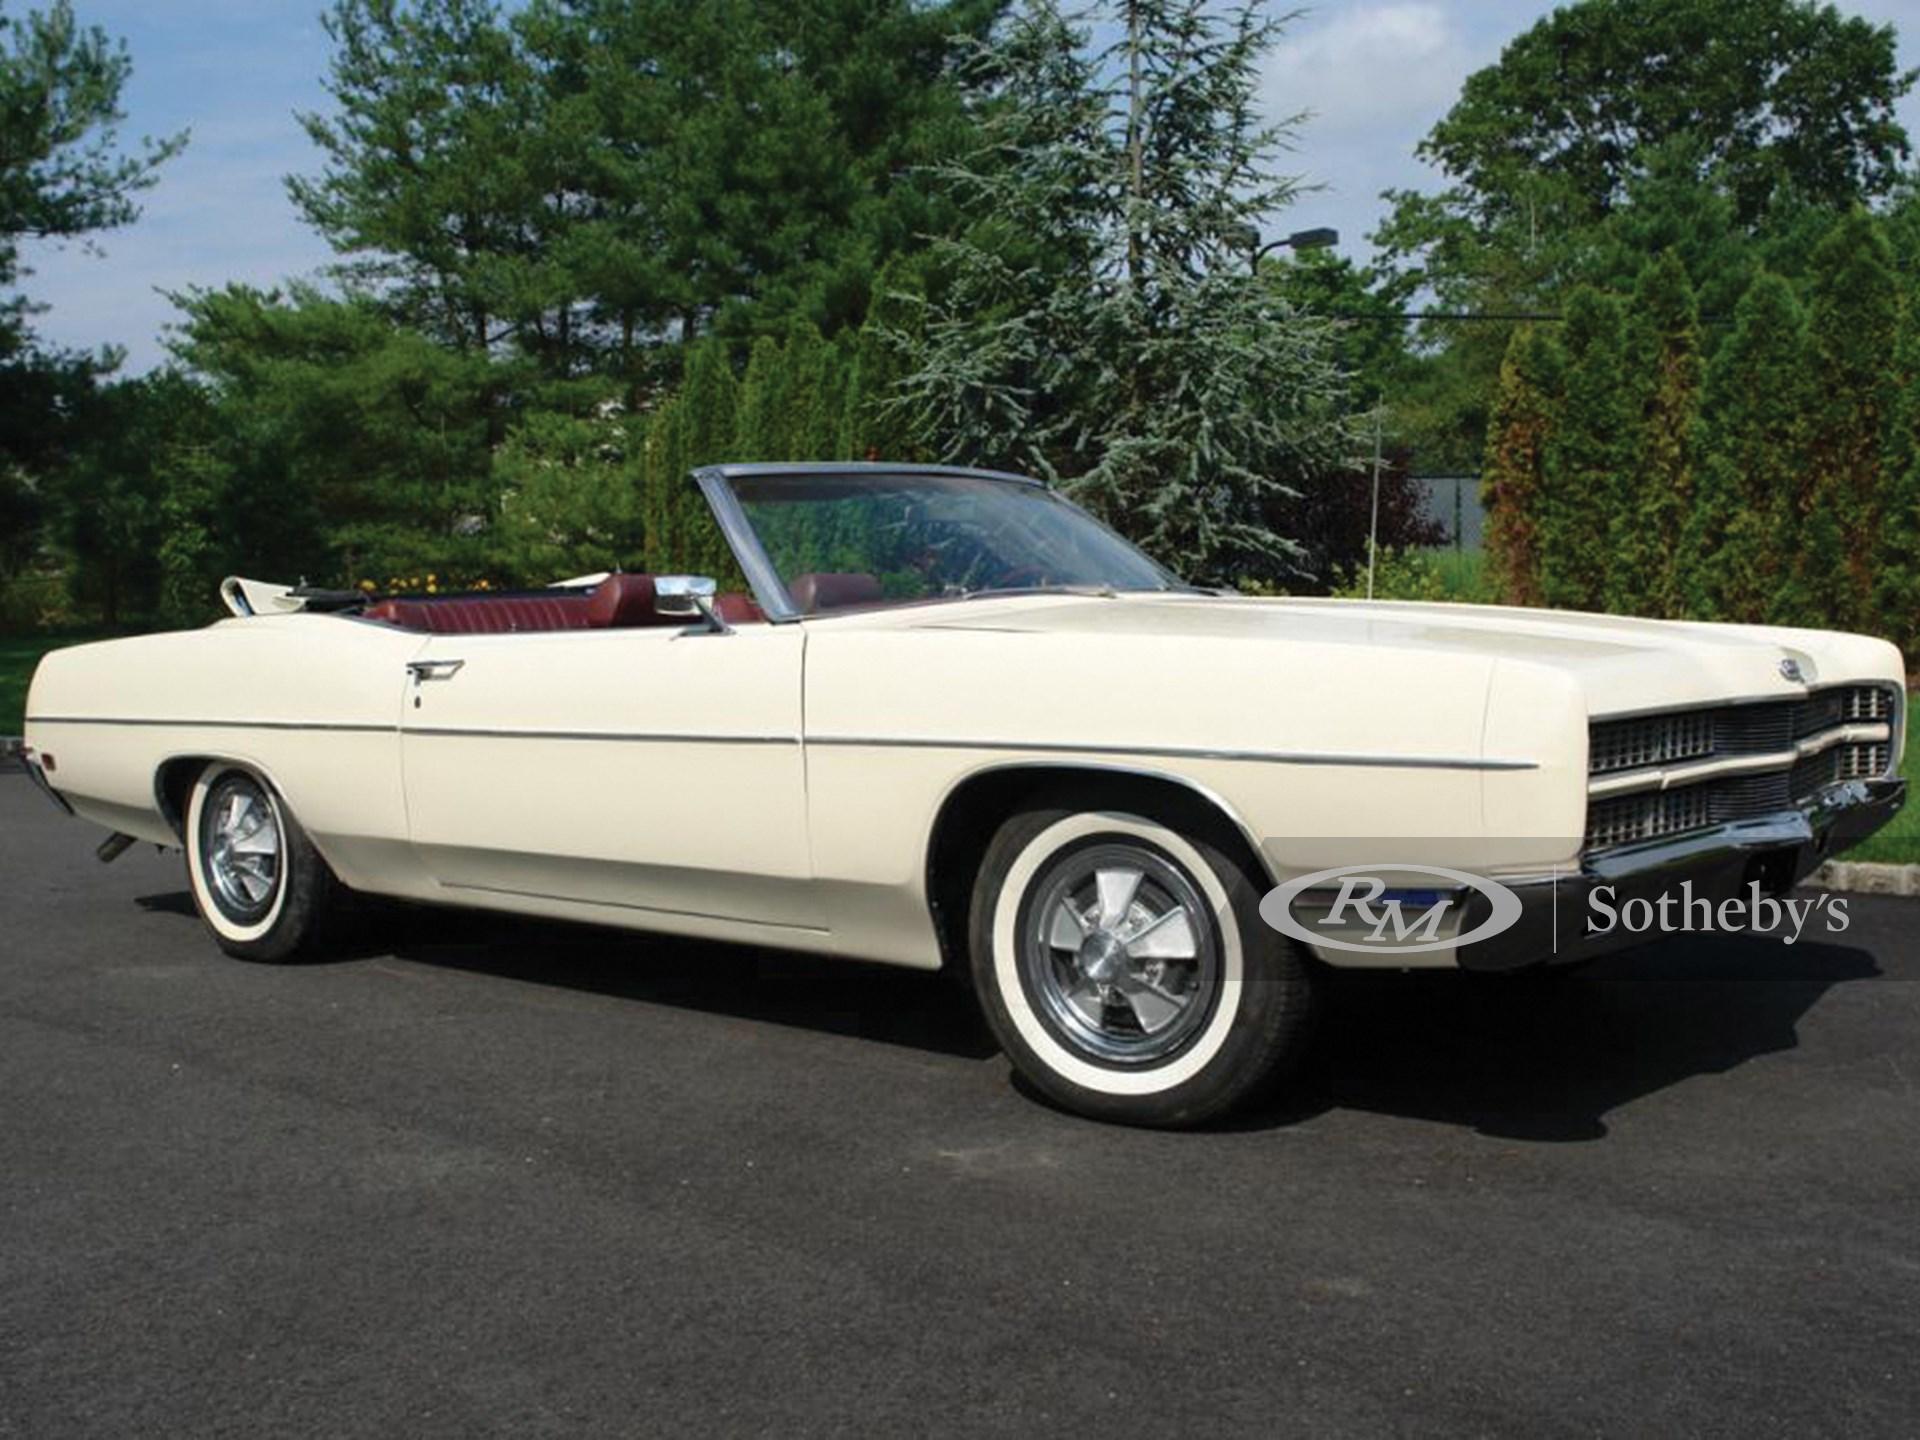 1969 Ford Galaxie 500 XL